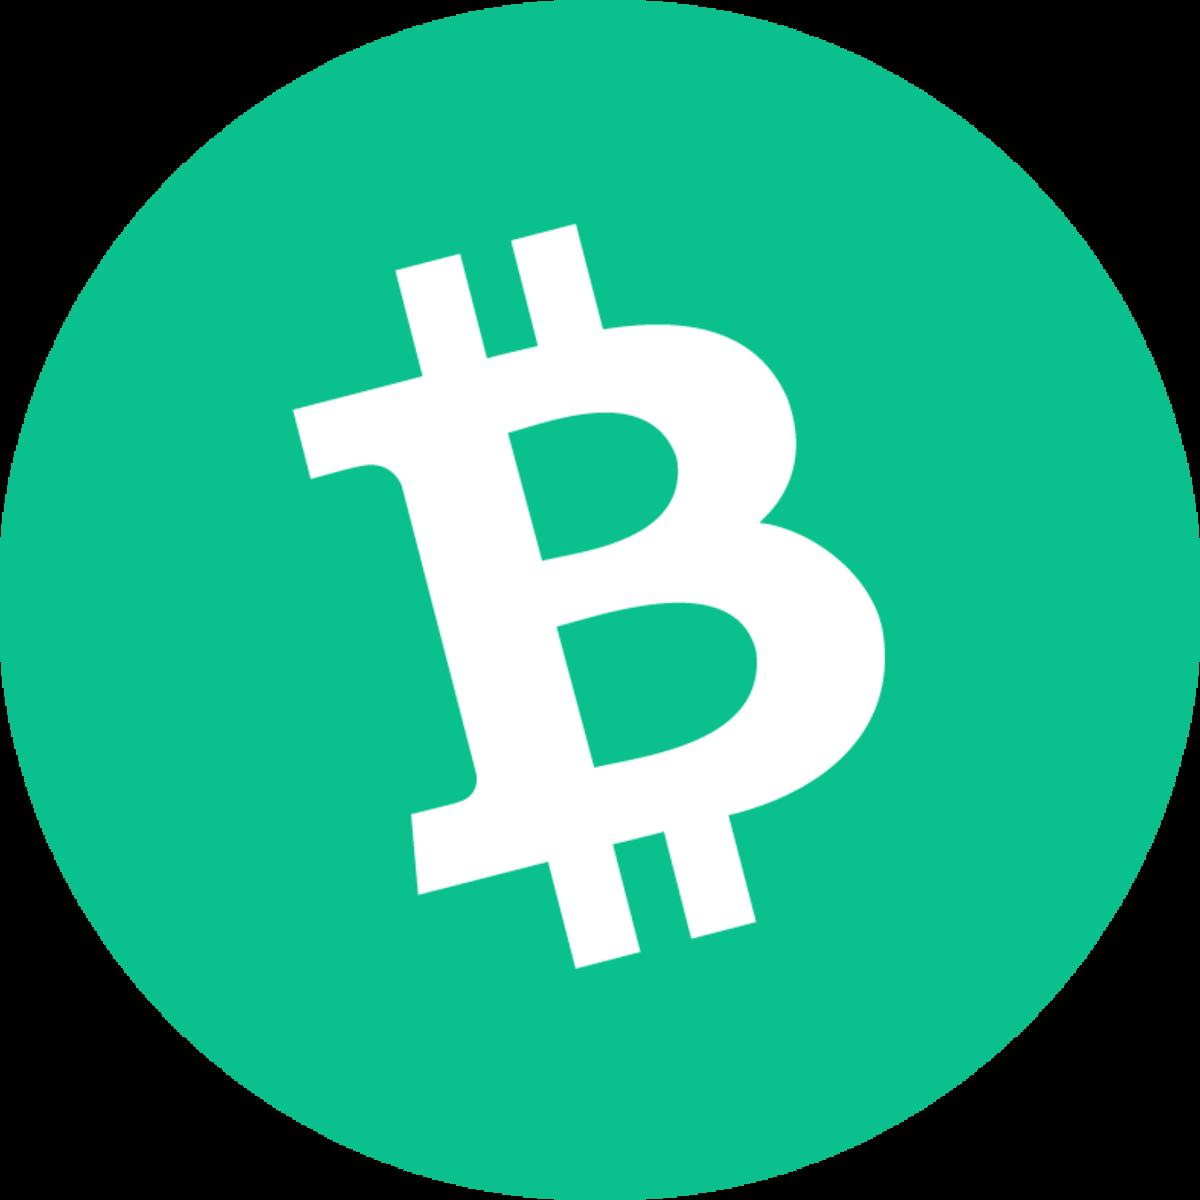 The Bitcoin Cash logo